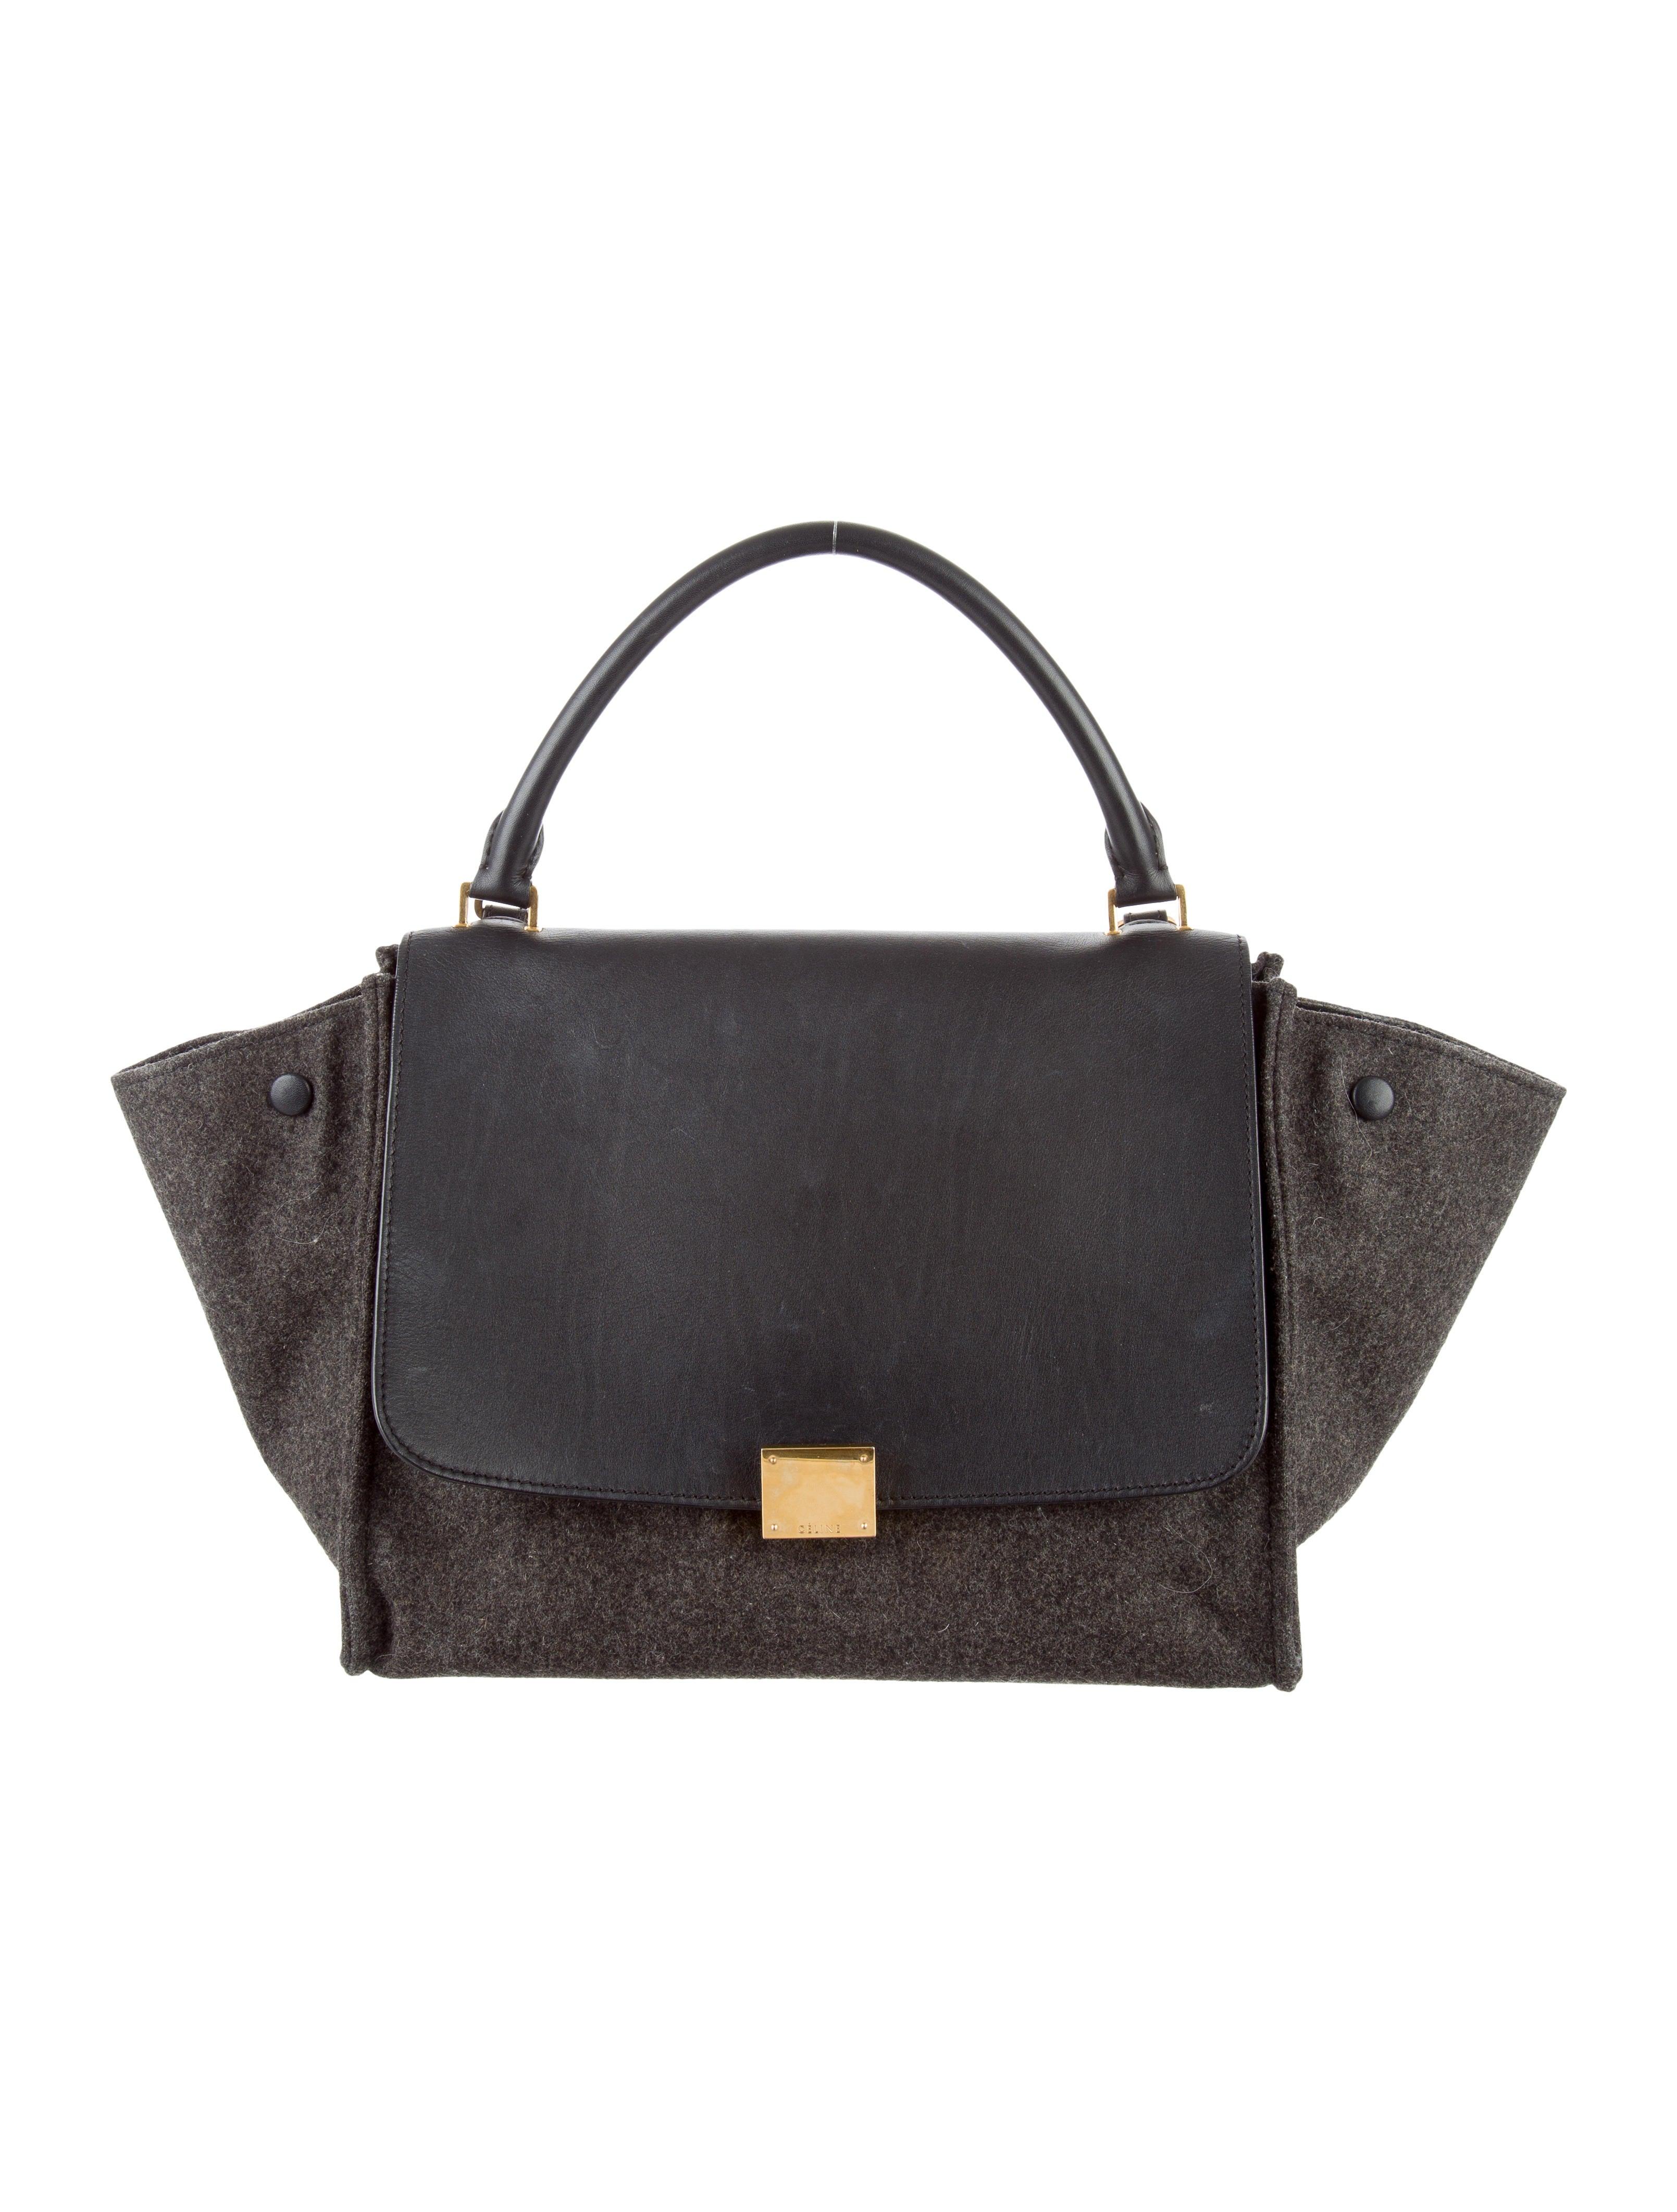 Celine Céline Medium Wool Trapeze Bag - Handbags - CEL47903  f1c4fed112a74